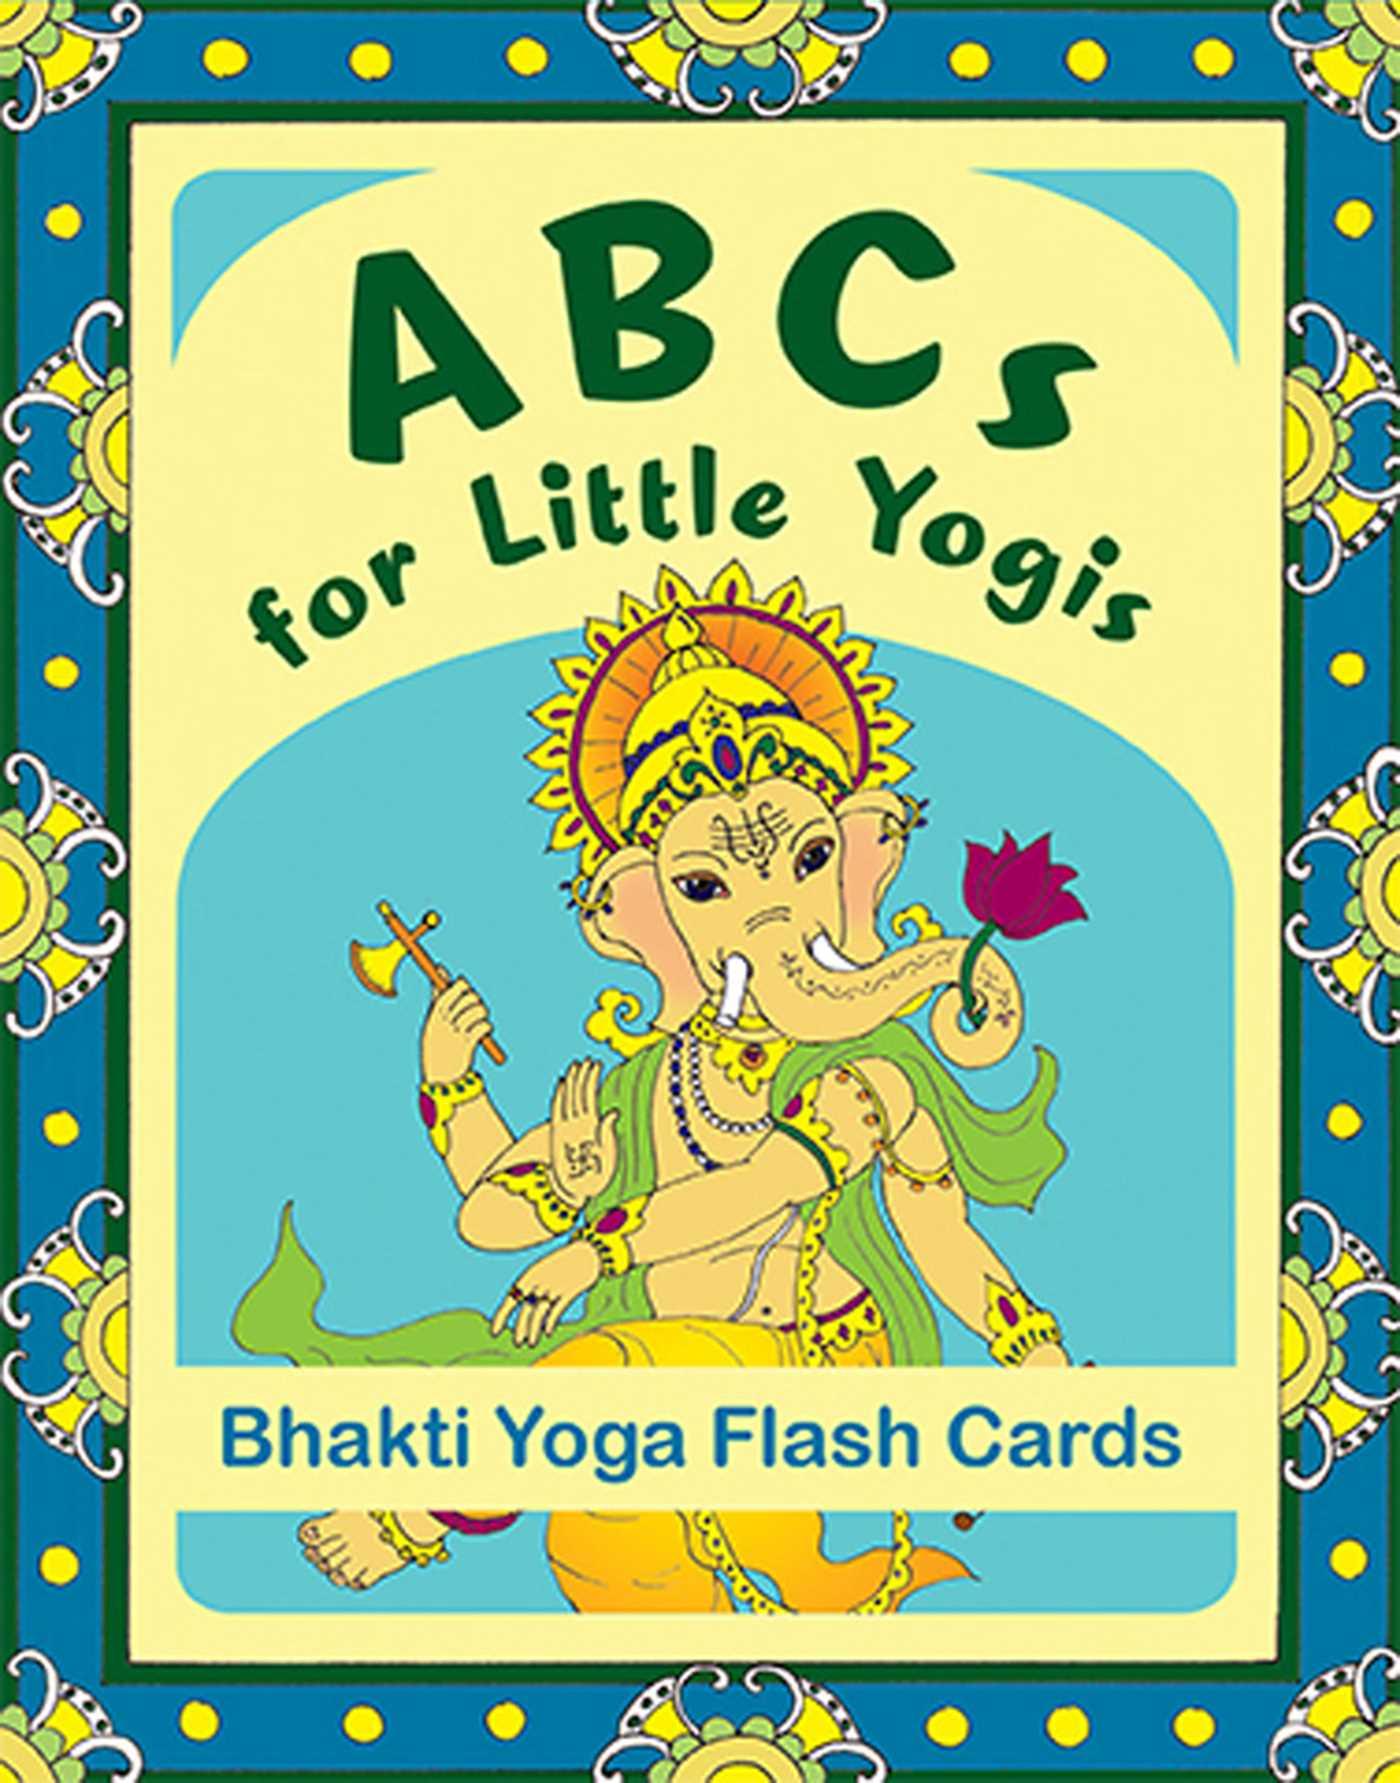 ABCs for Little Yogis